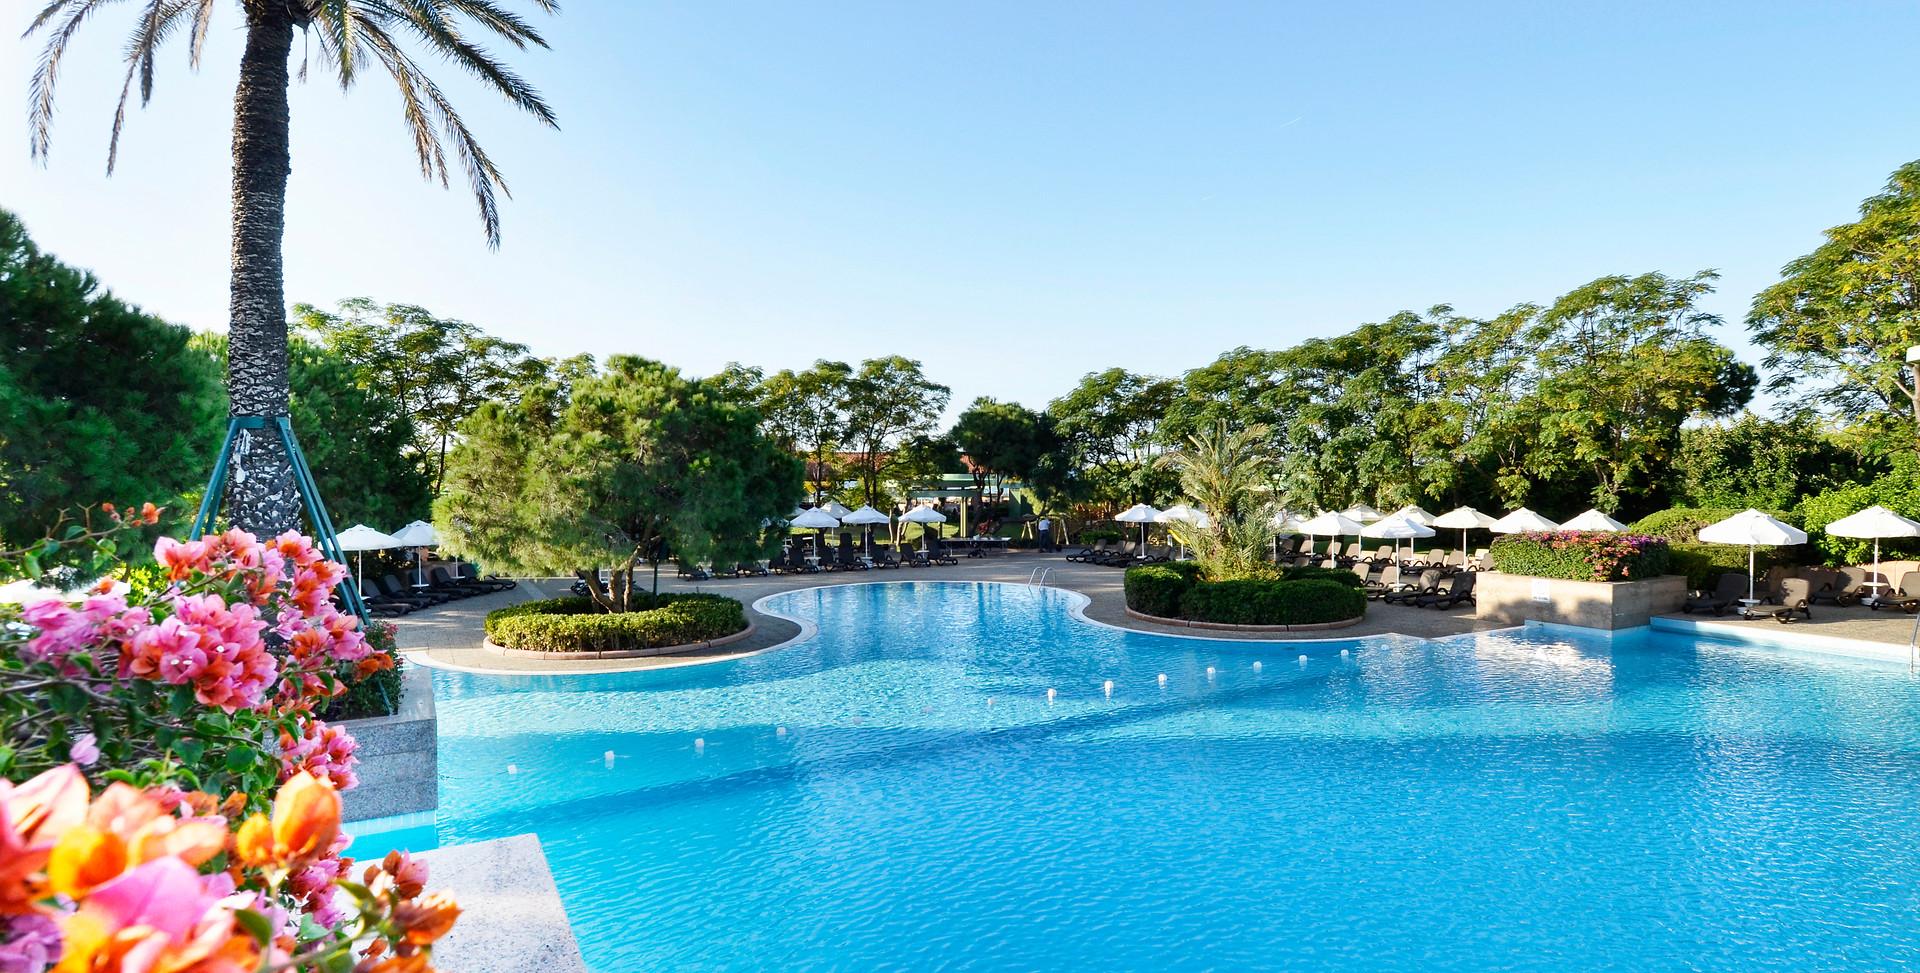 Gloria_verde_resort_puregolf-travel (15)